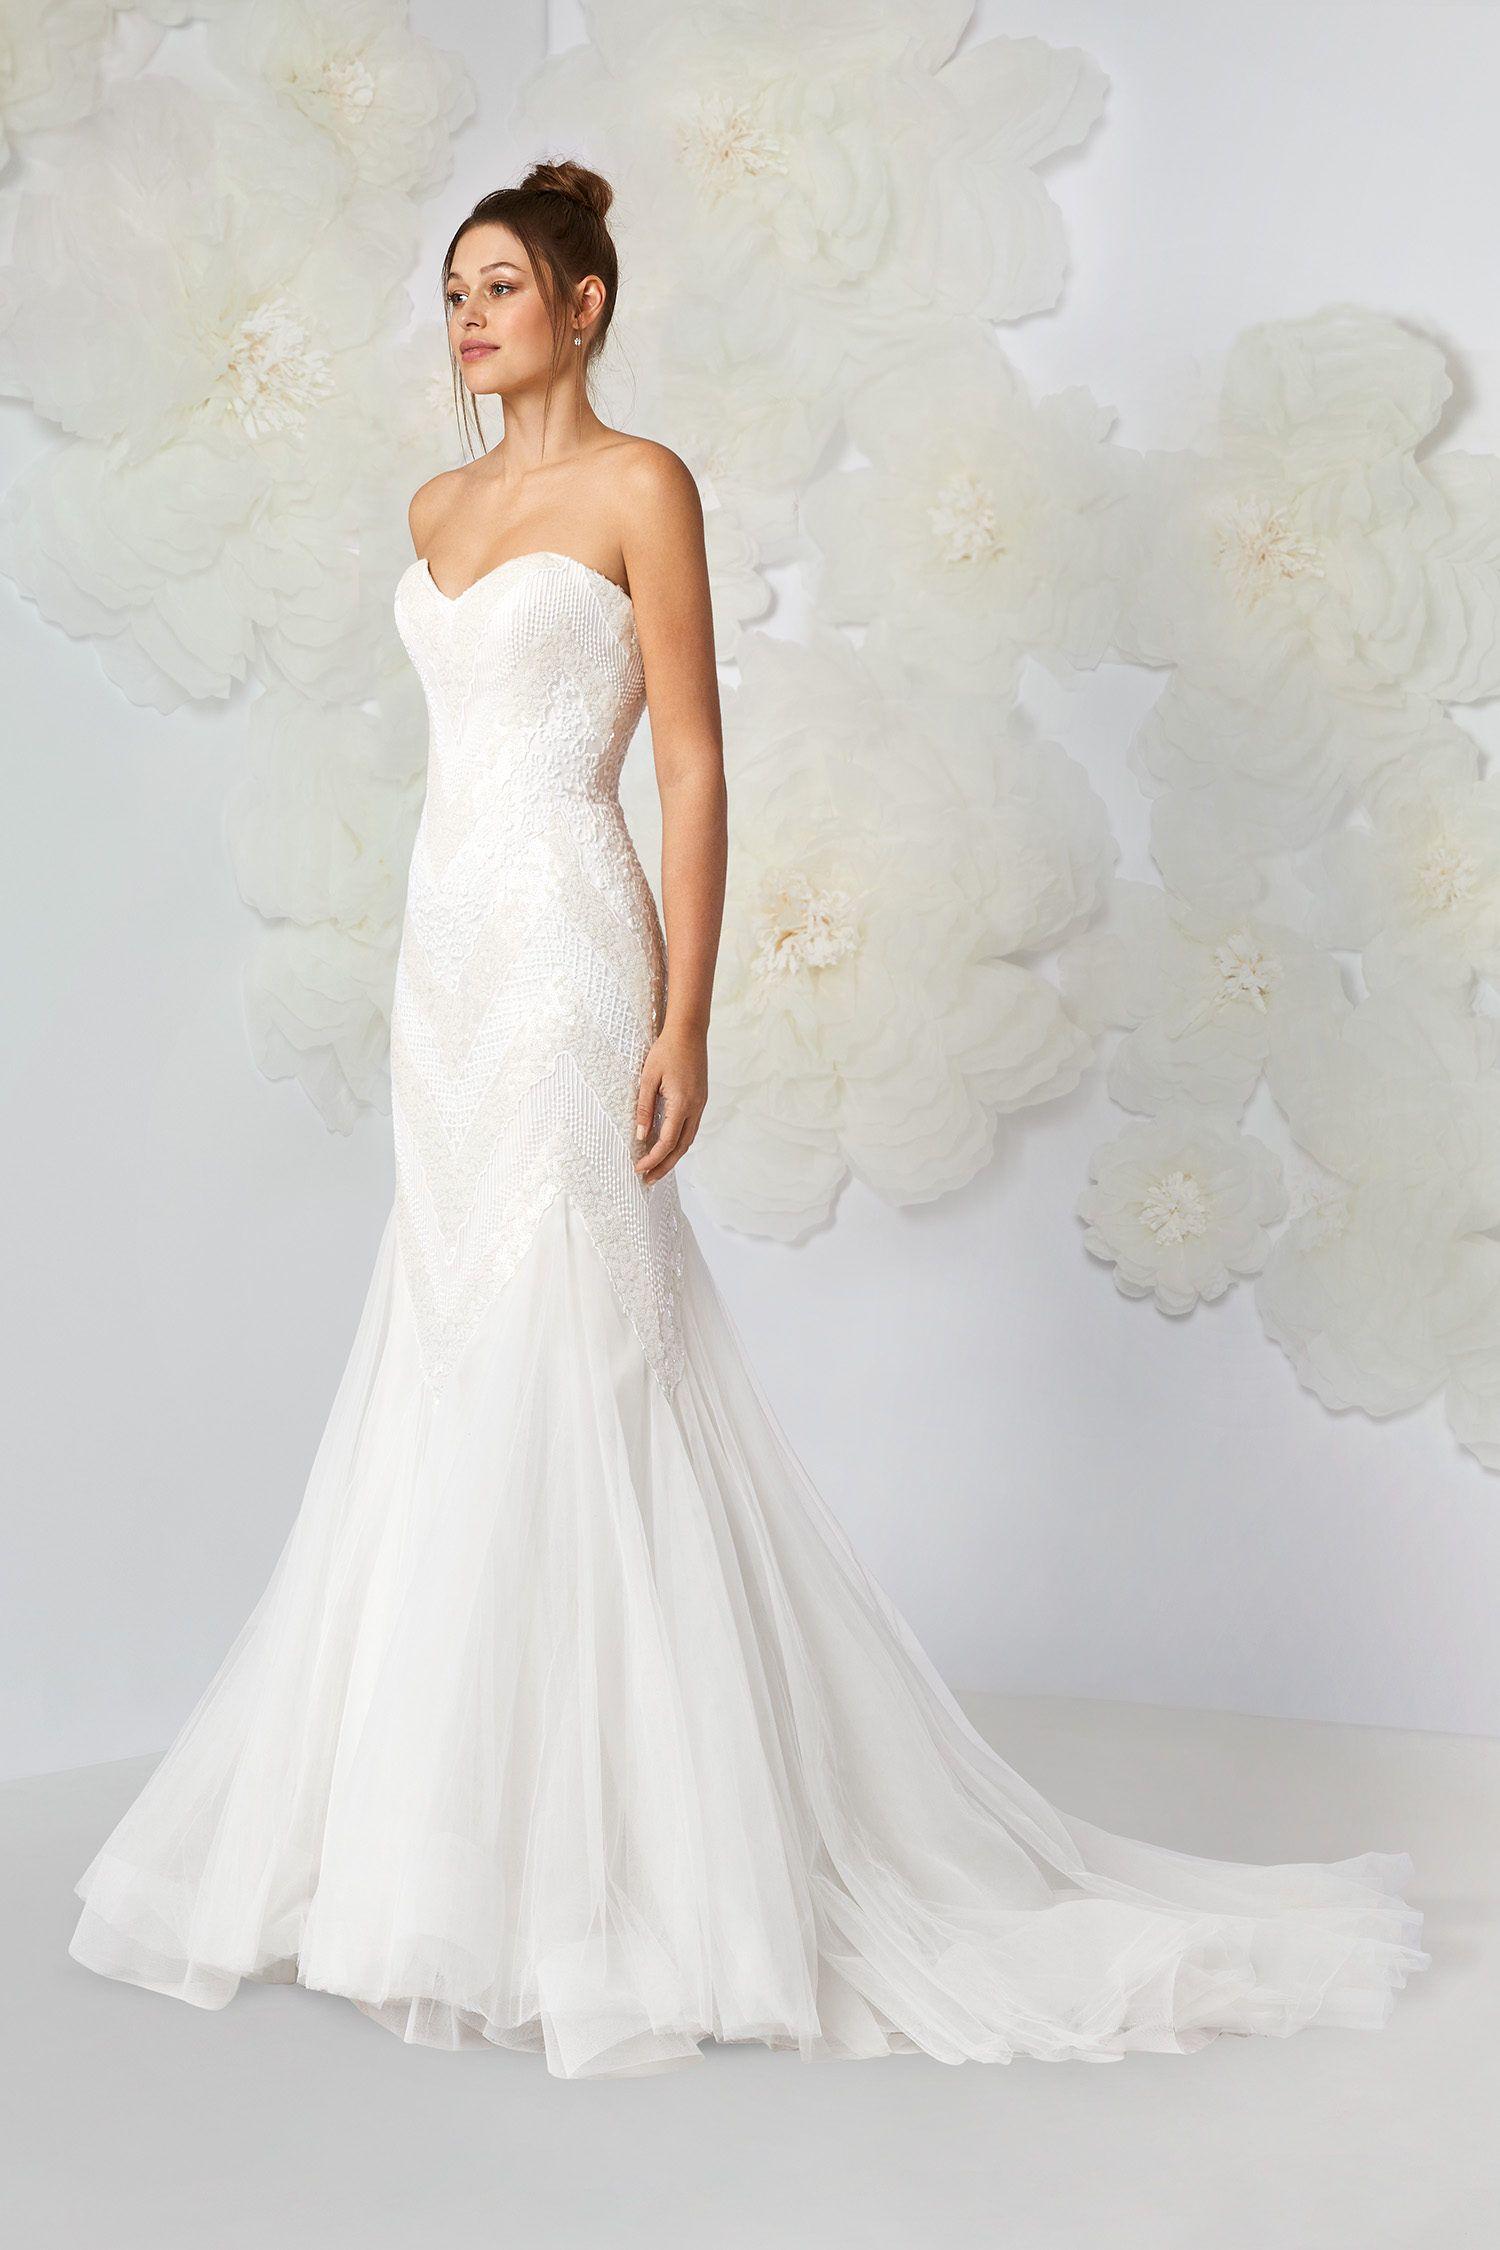 justine_f | wedding dresses | dress hairstyles, dresses